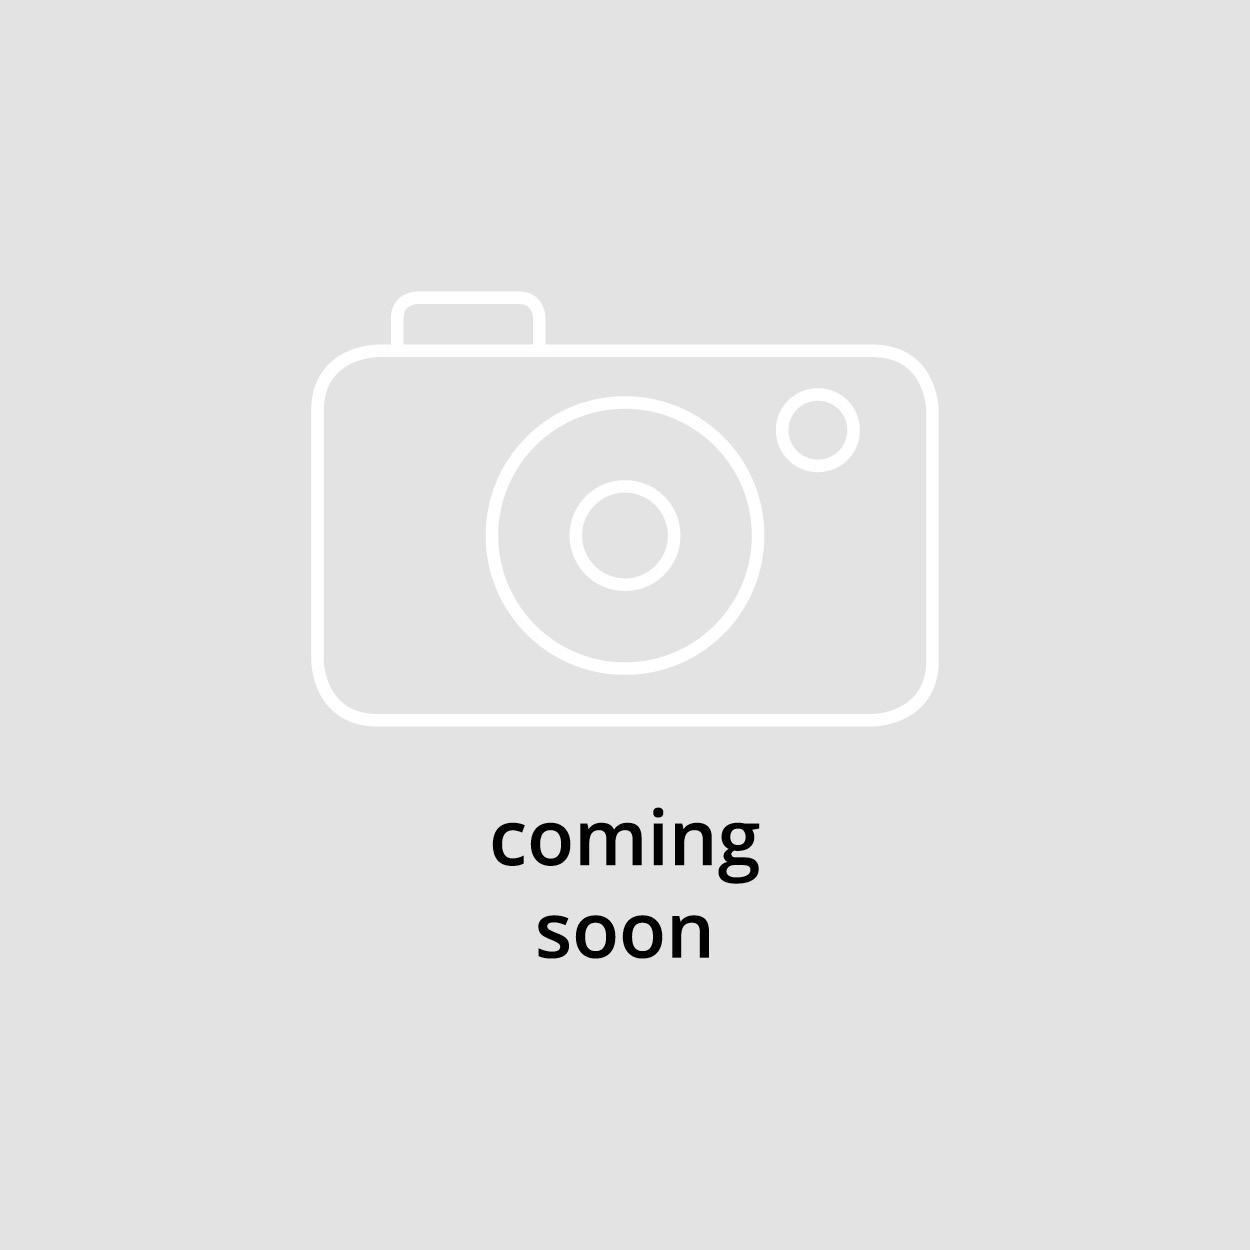 1504116, 15.04.116, 15 04 116, 0B1504116, Tamburello per albero traslazione tamburo Gildemeister GS20, GM20, GM20AC